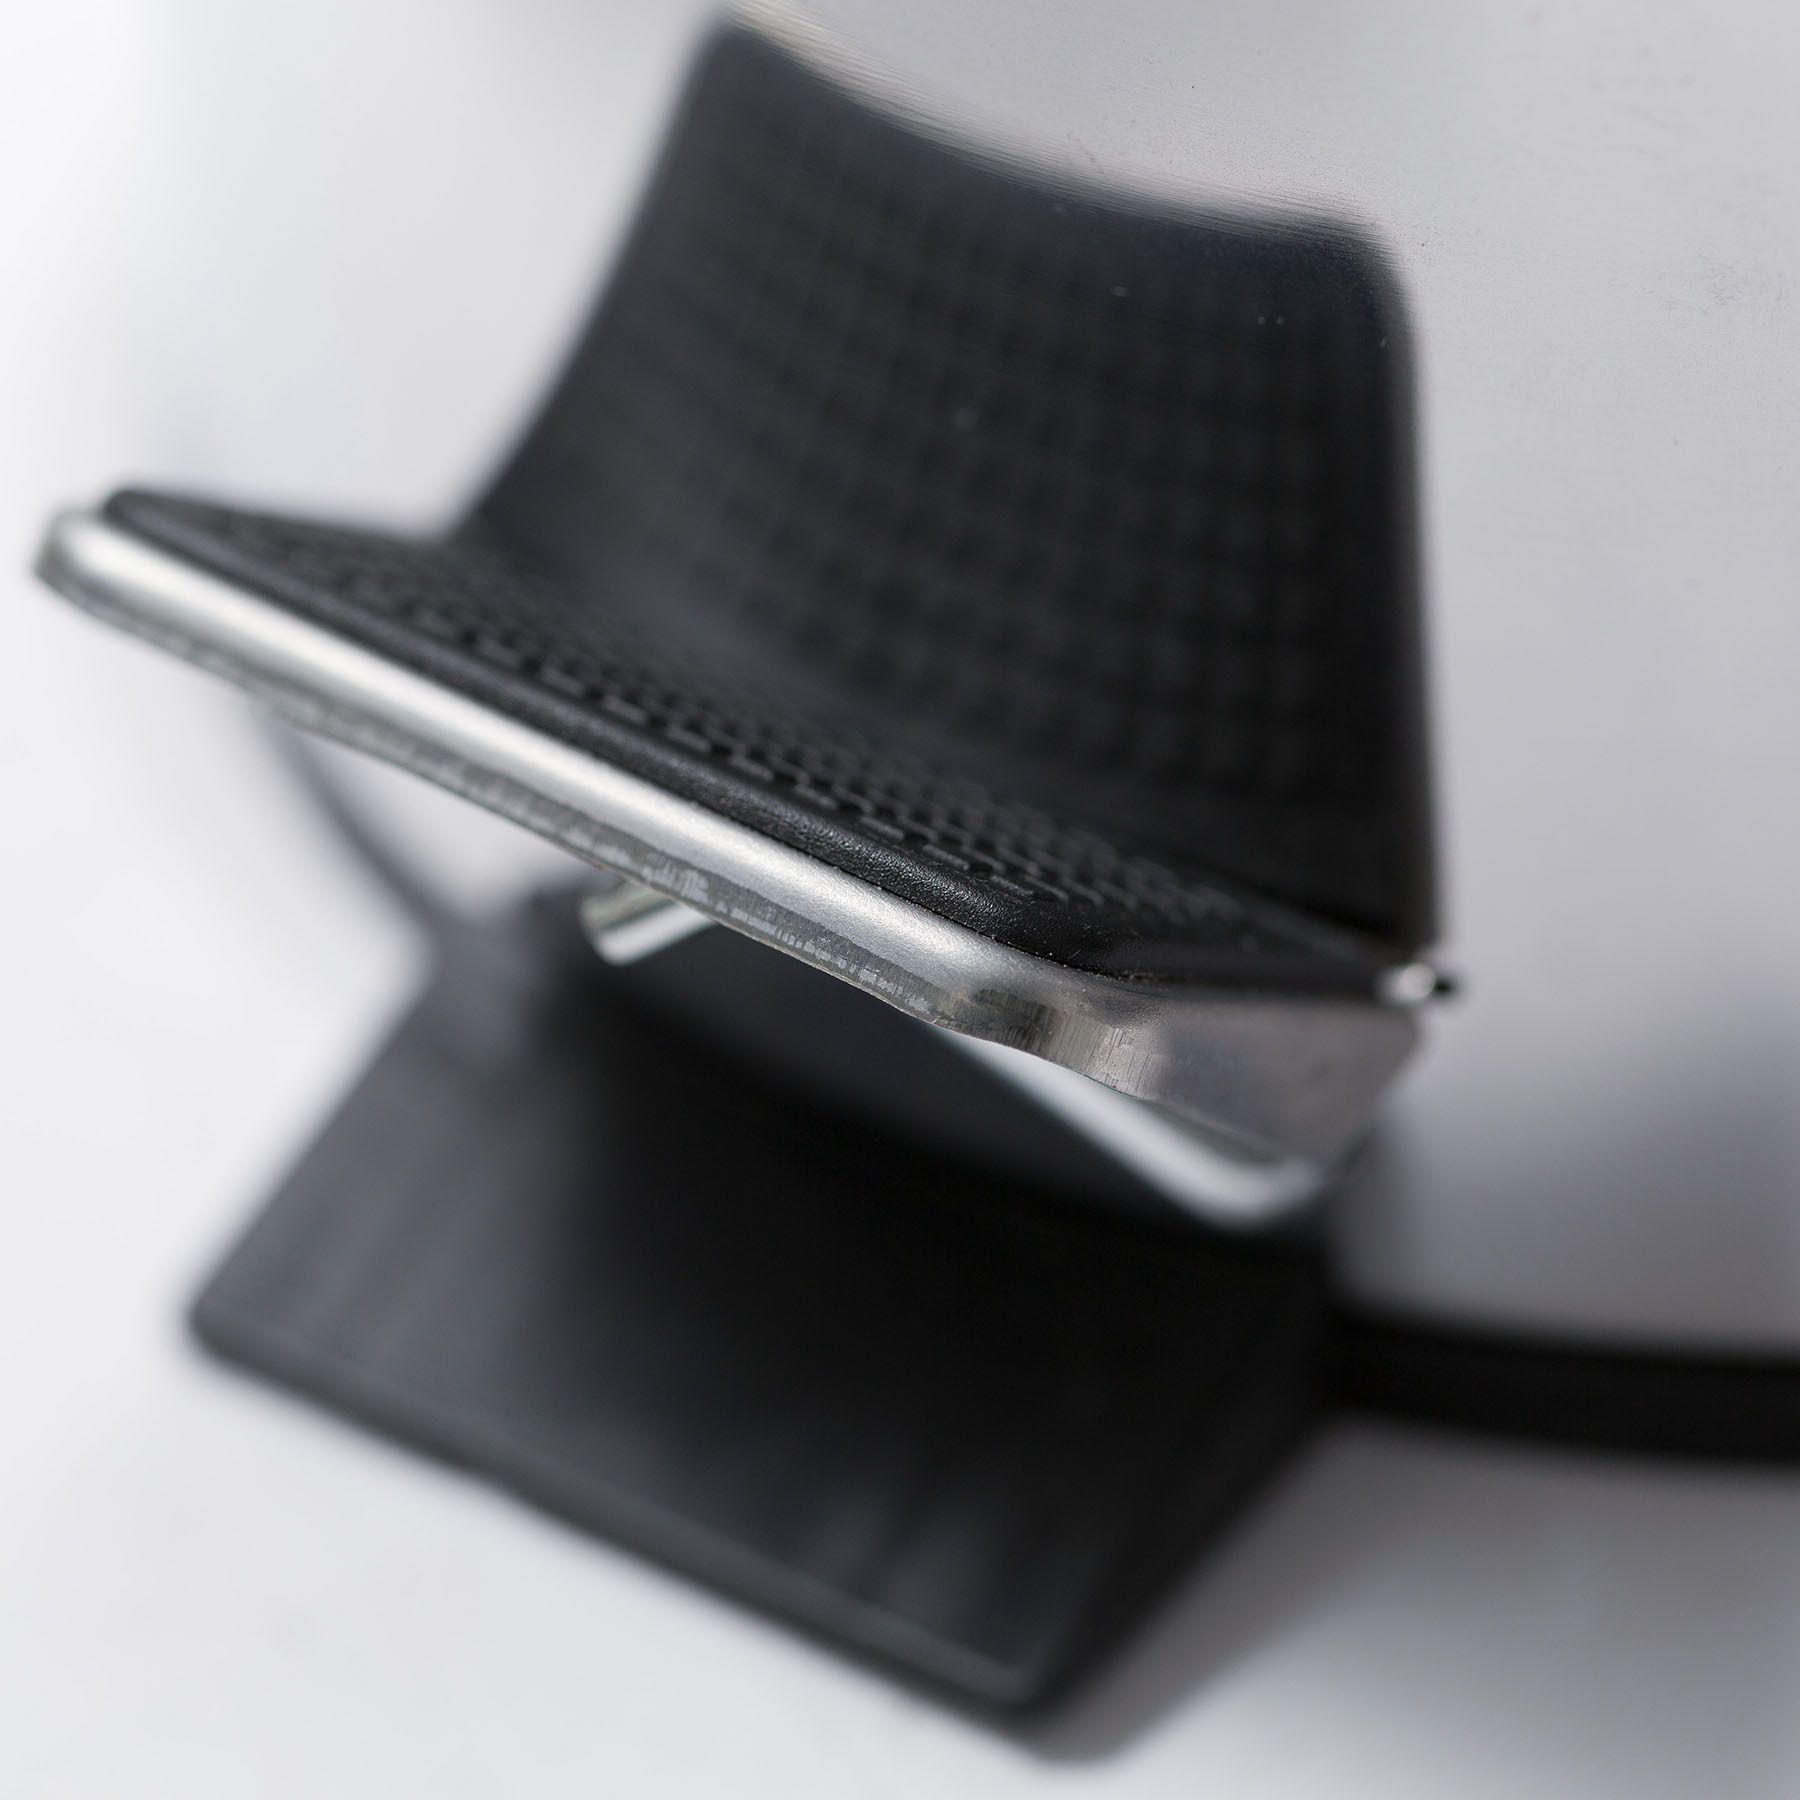 Pack 4 Unid. Lixeira Aço Inox 3 Litros com tampa e pedal cesto interno removivel - Dallare DL1324